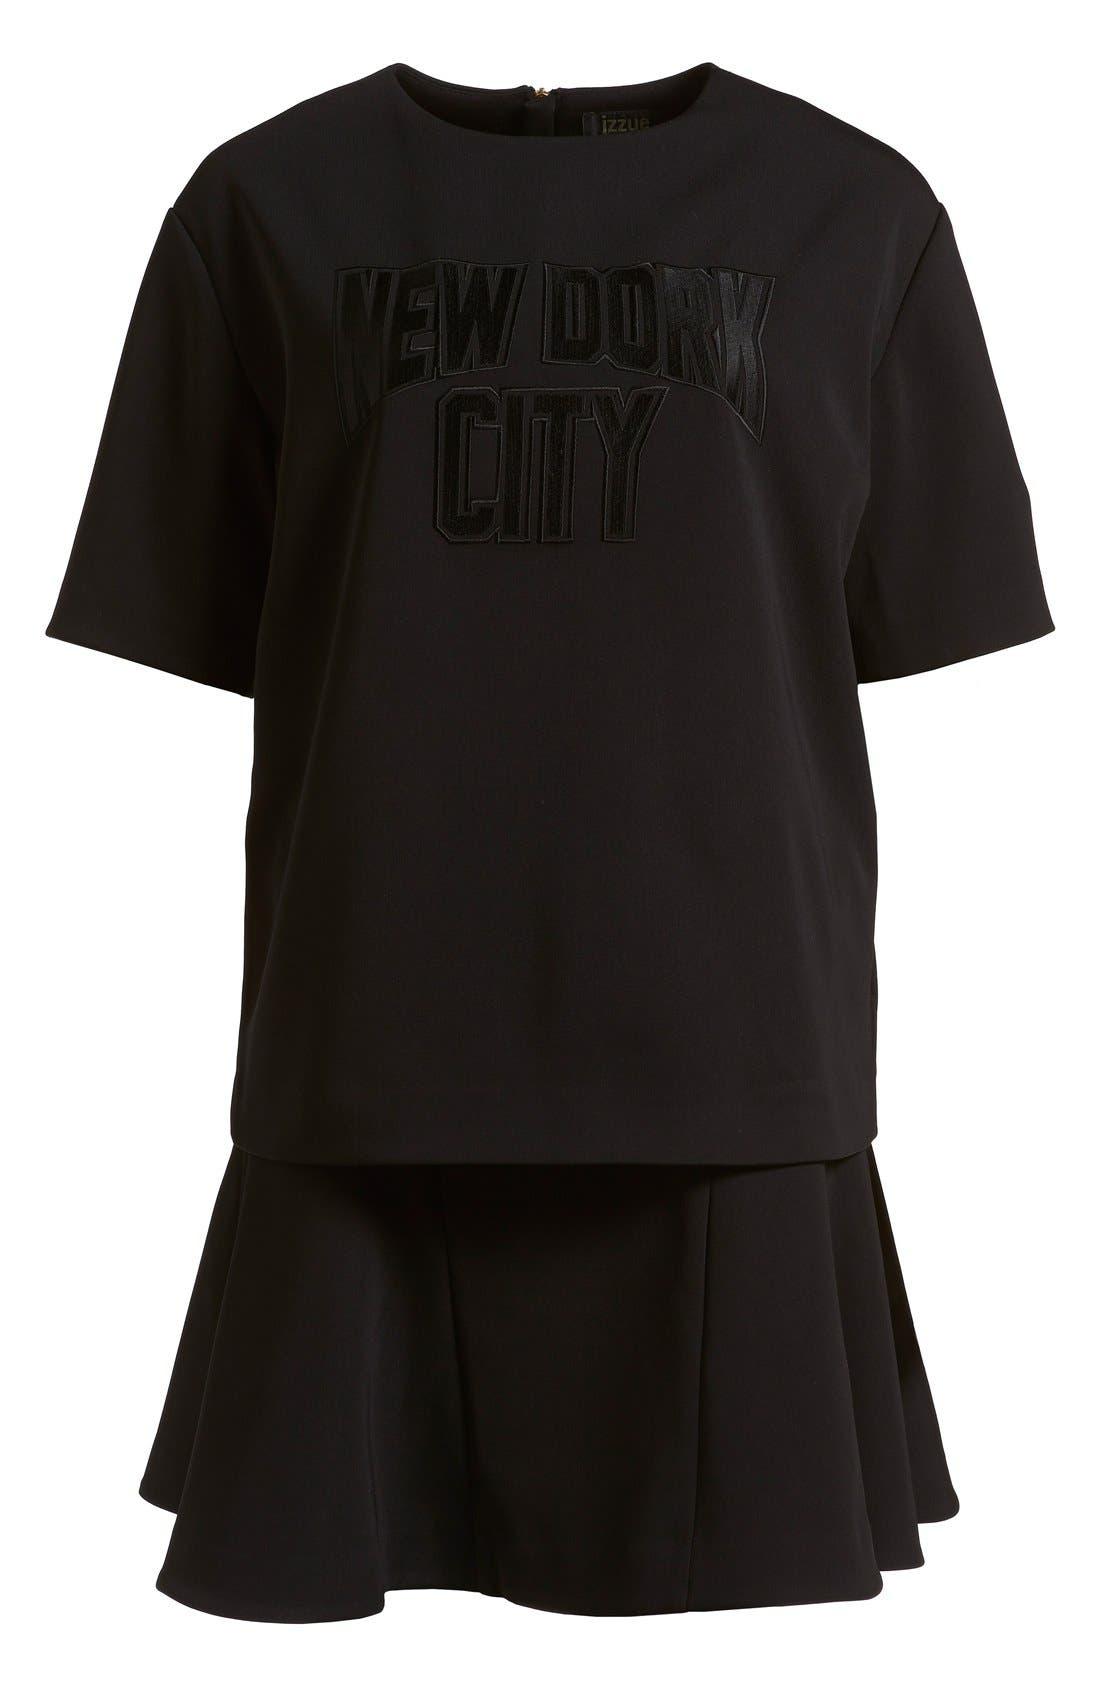 Main Image - izzue Bonded T-Shirt Dress (Women)